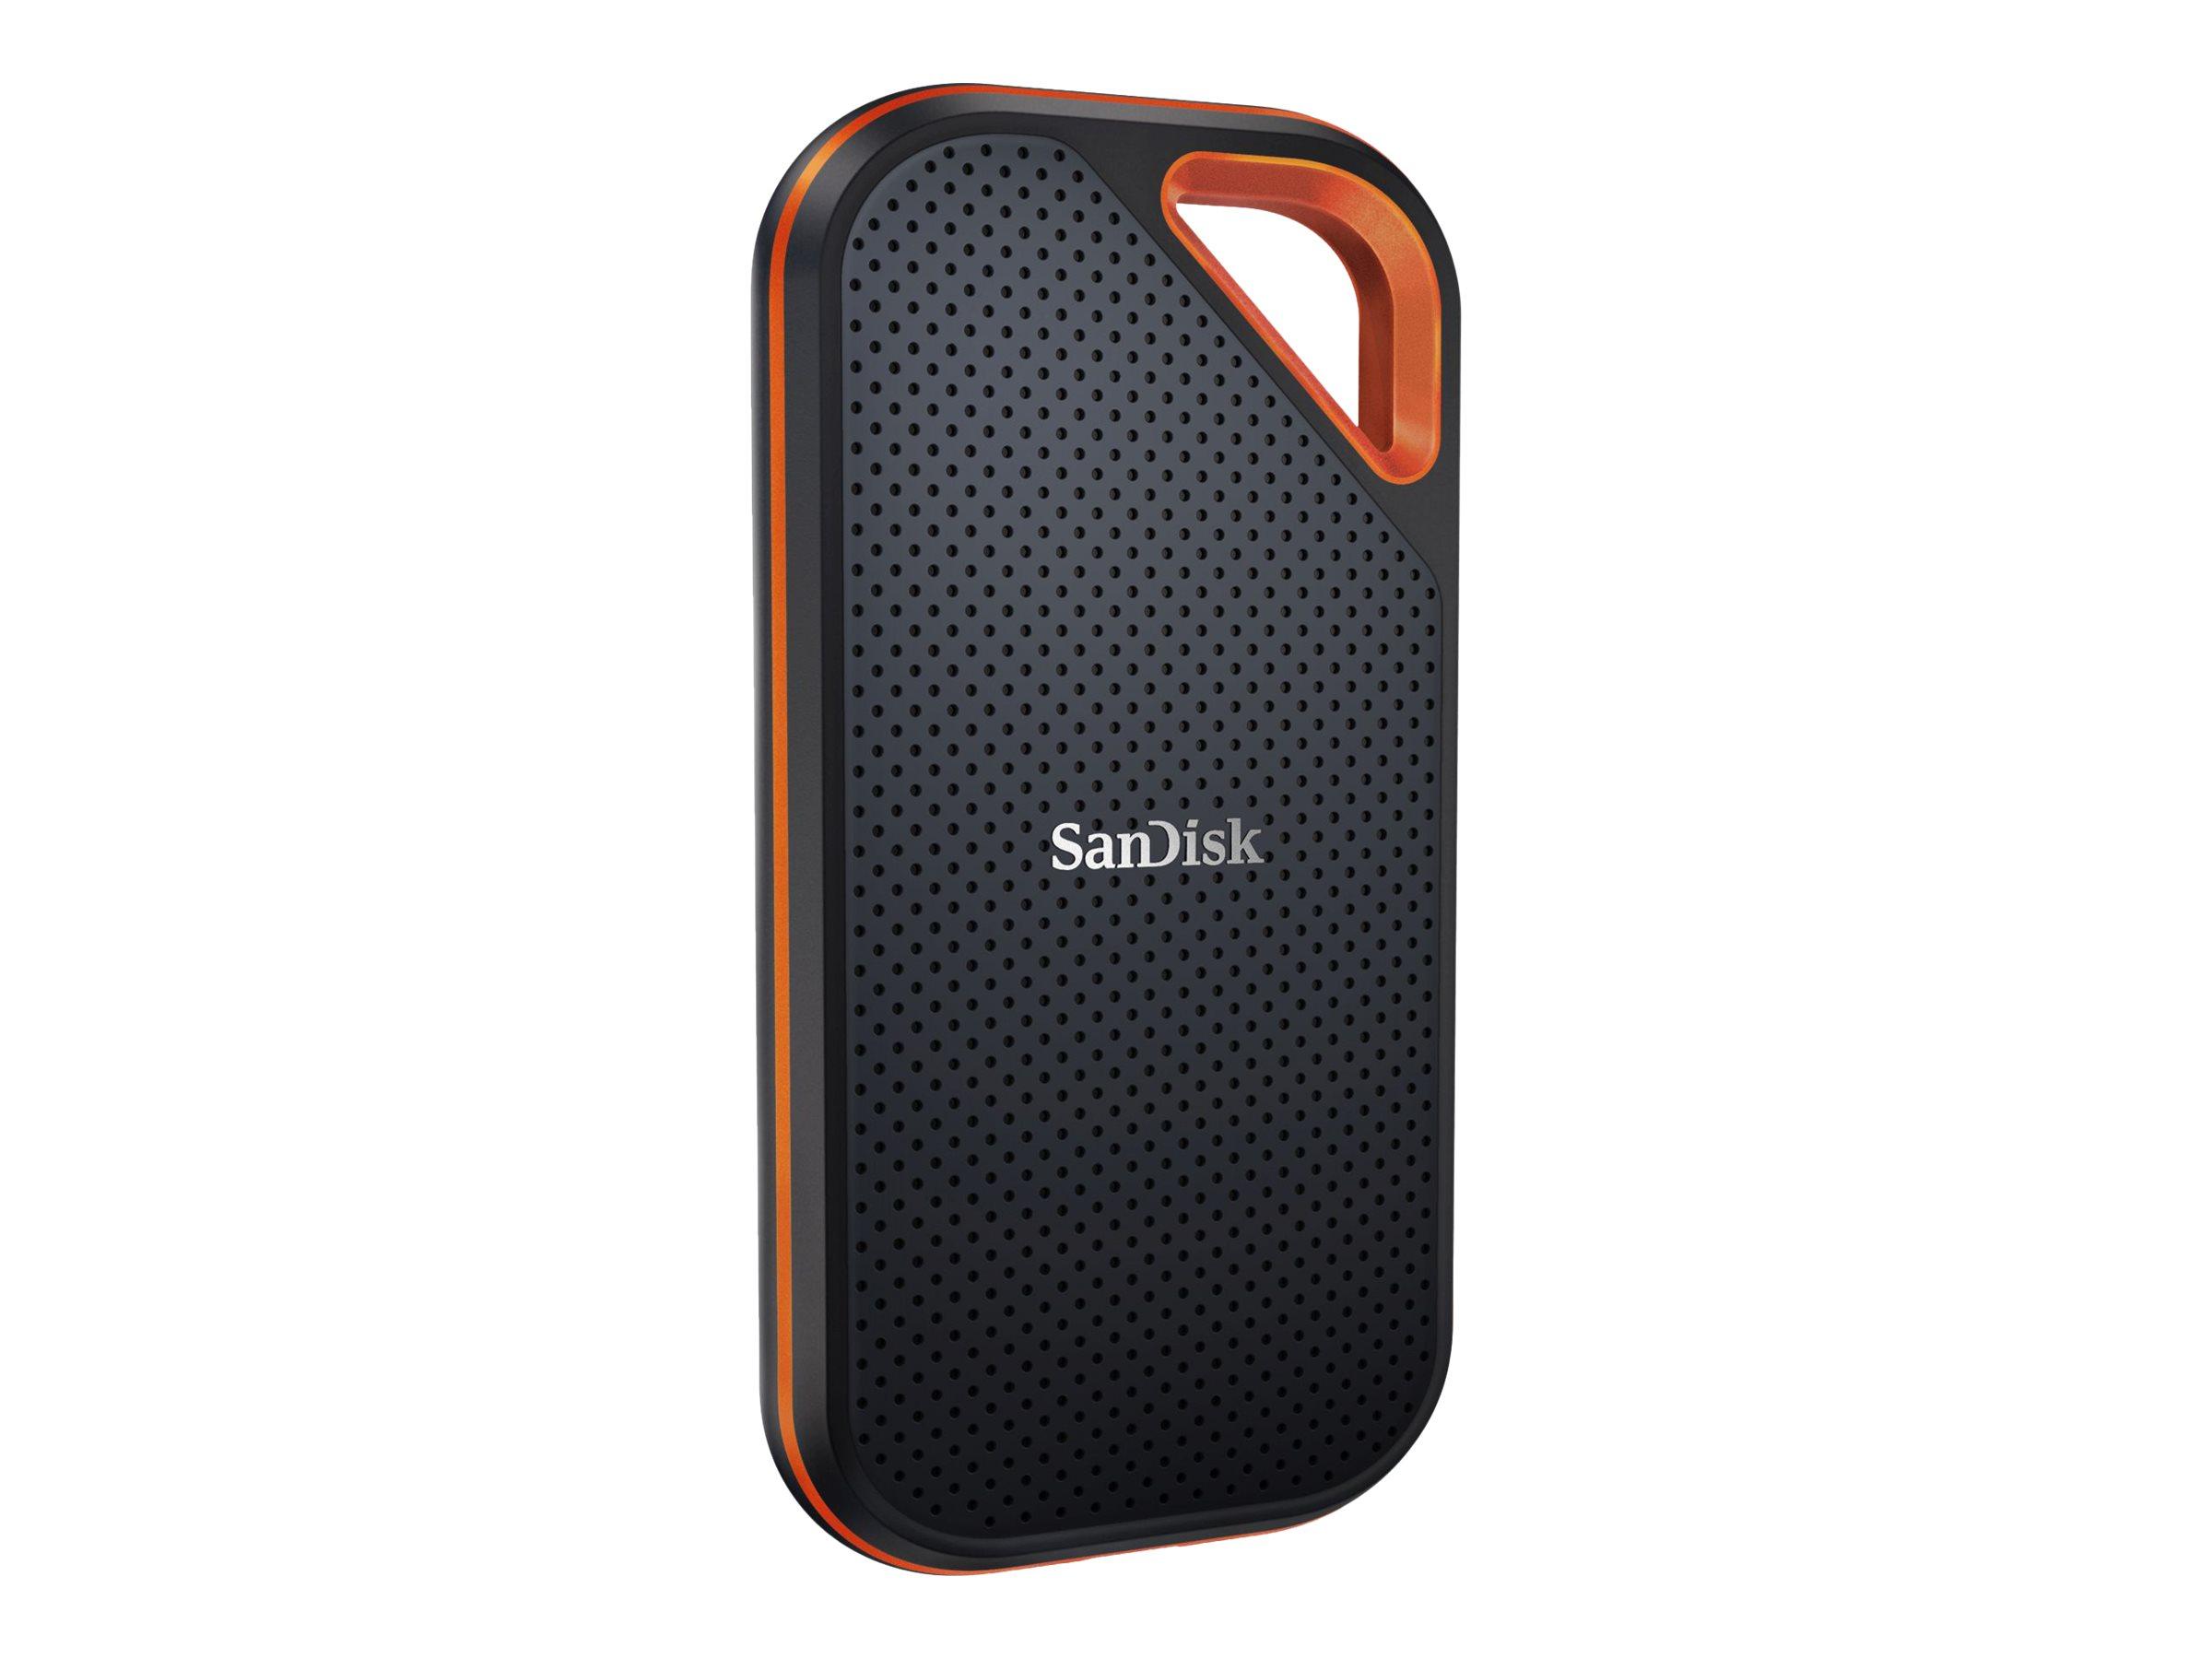 SanDisk Extreme PRO Portable - 1 TB SSD - extern (tragbar)